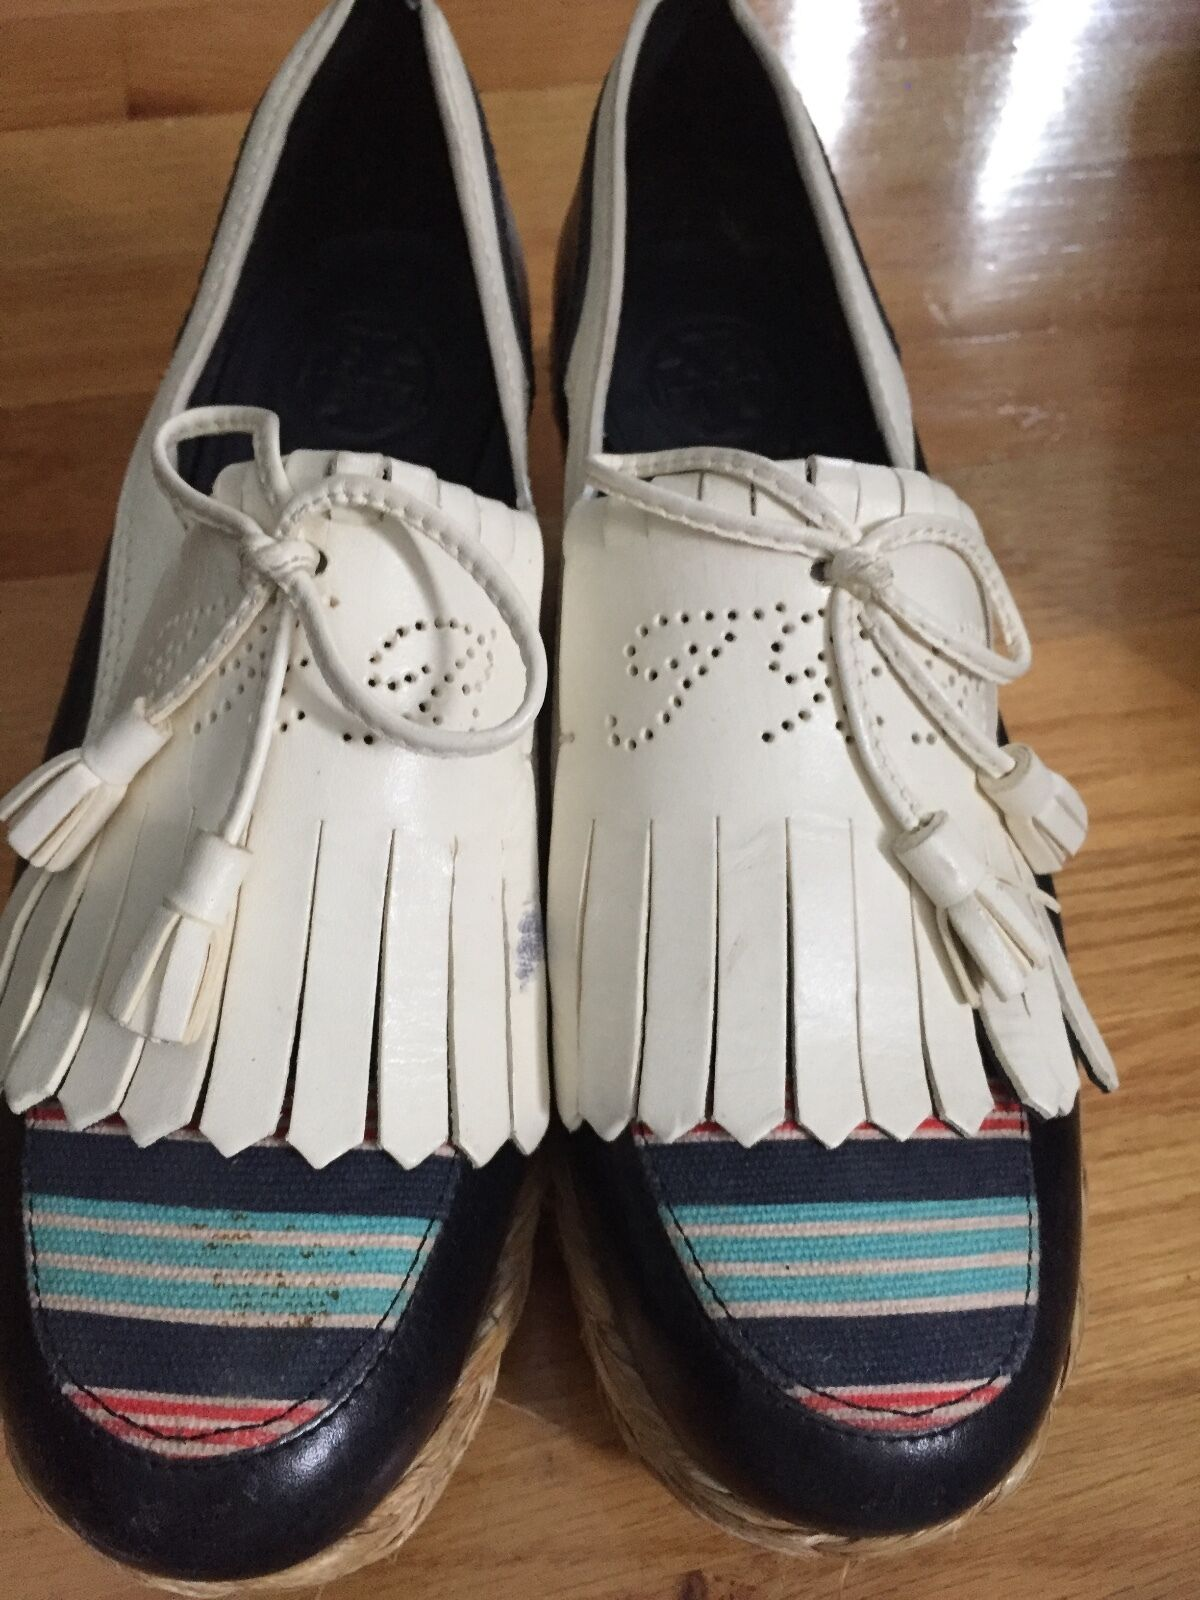 Tory Burch Wedge Größe heels , Größe Wedge 7 029691